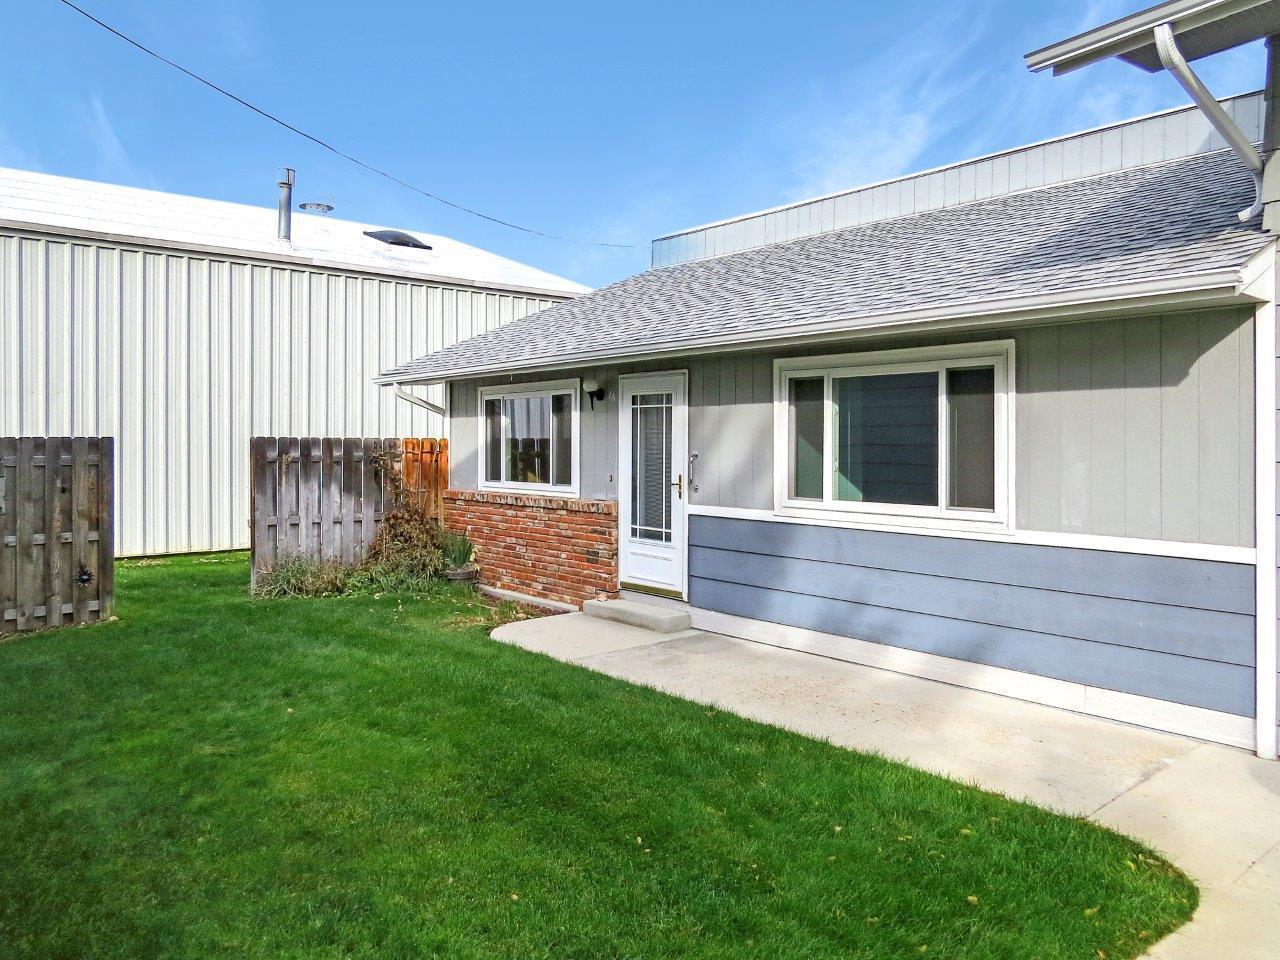 1500 DeSmet Avenue, Sheridan, Wyoming 82801, 2 Bedrooms Bedrooms, ,1 BathroomBathrooms,Residential,For Sale,DeSmet,19-1093